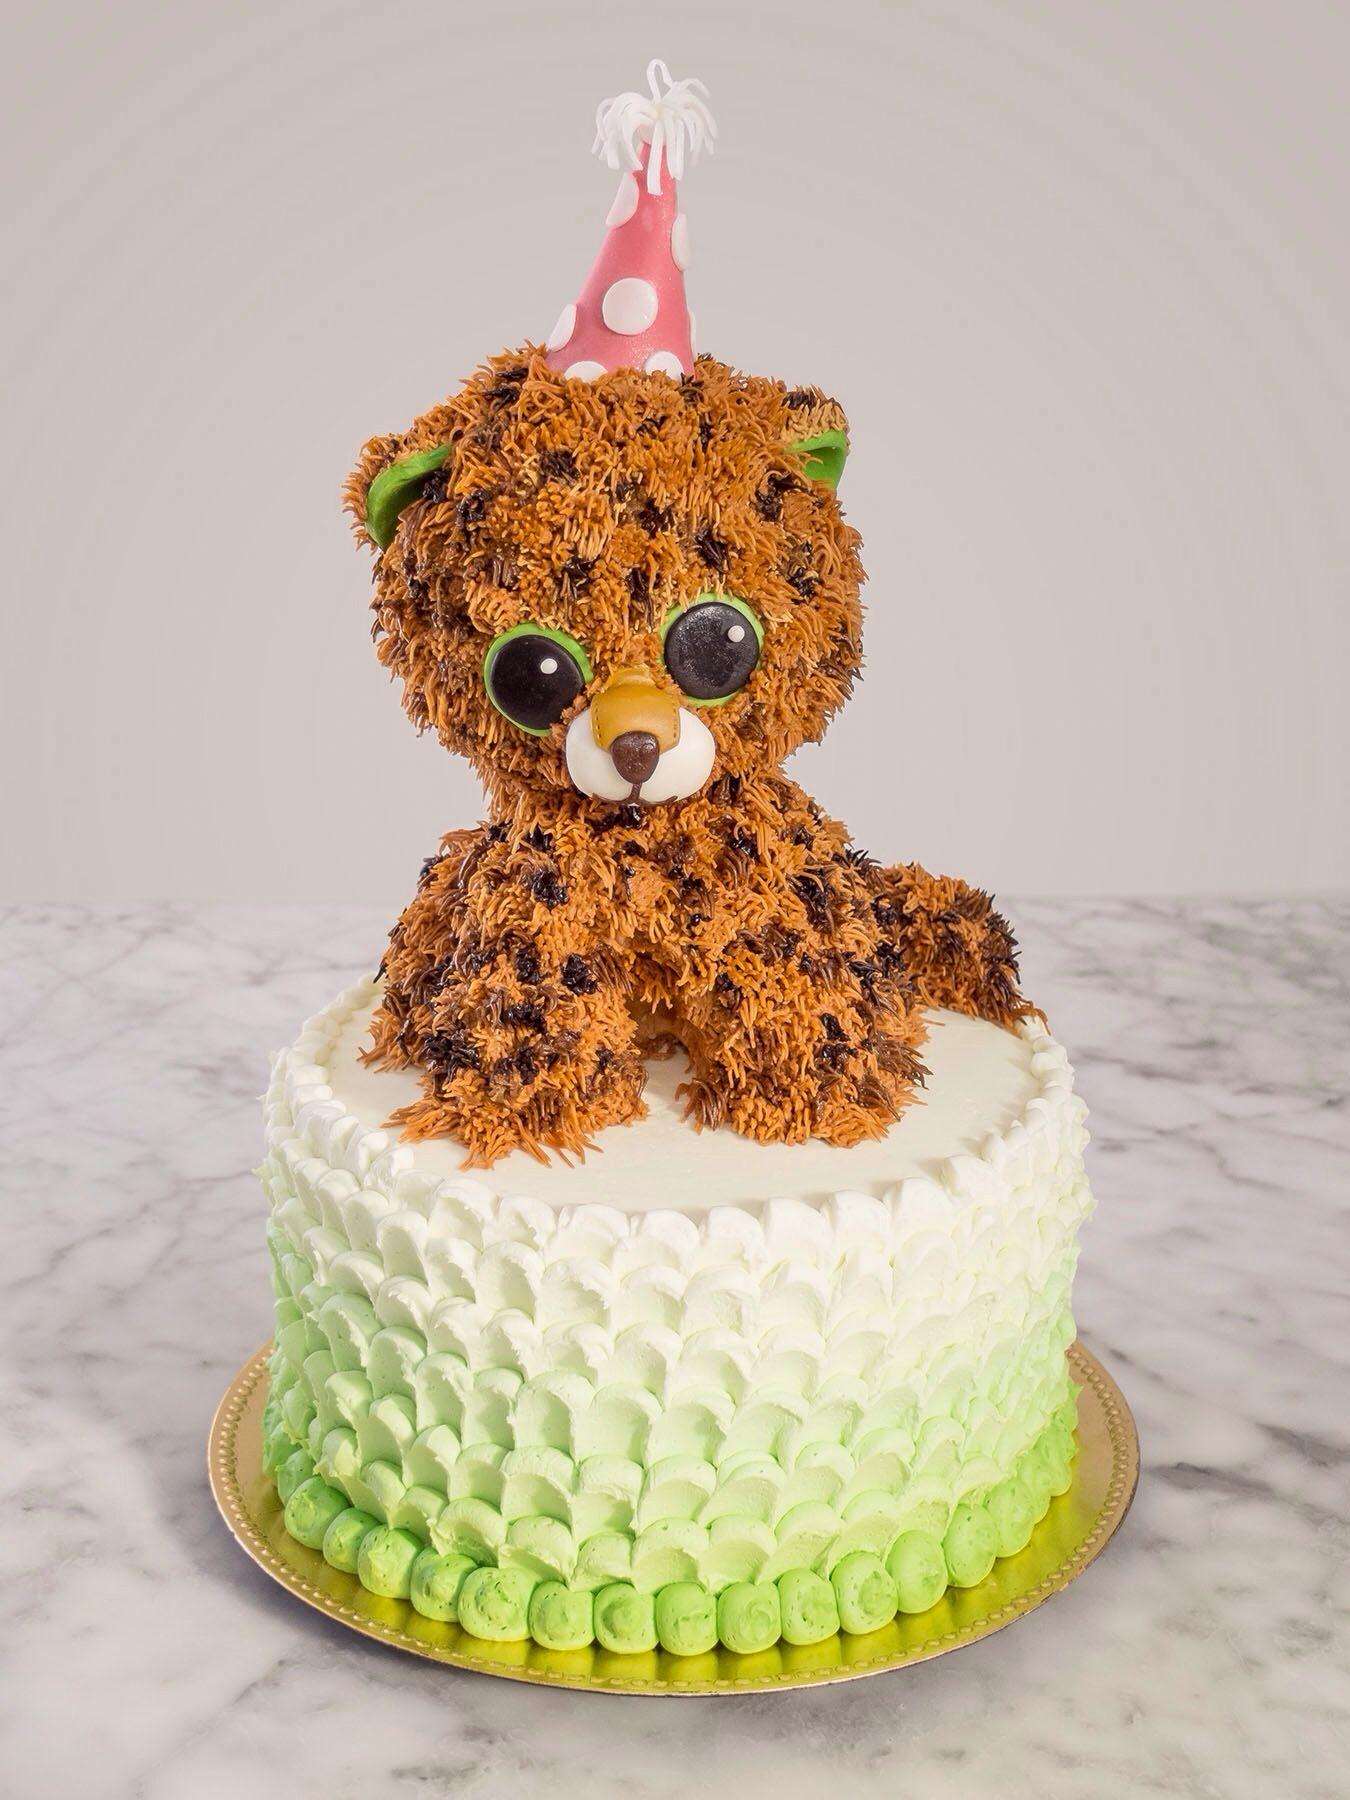 Beanie boo cake speckles  592882dfbbd